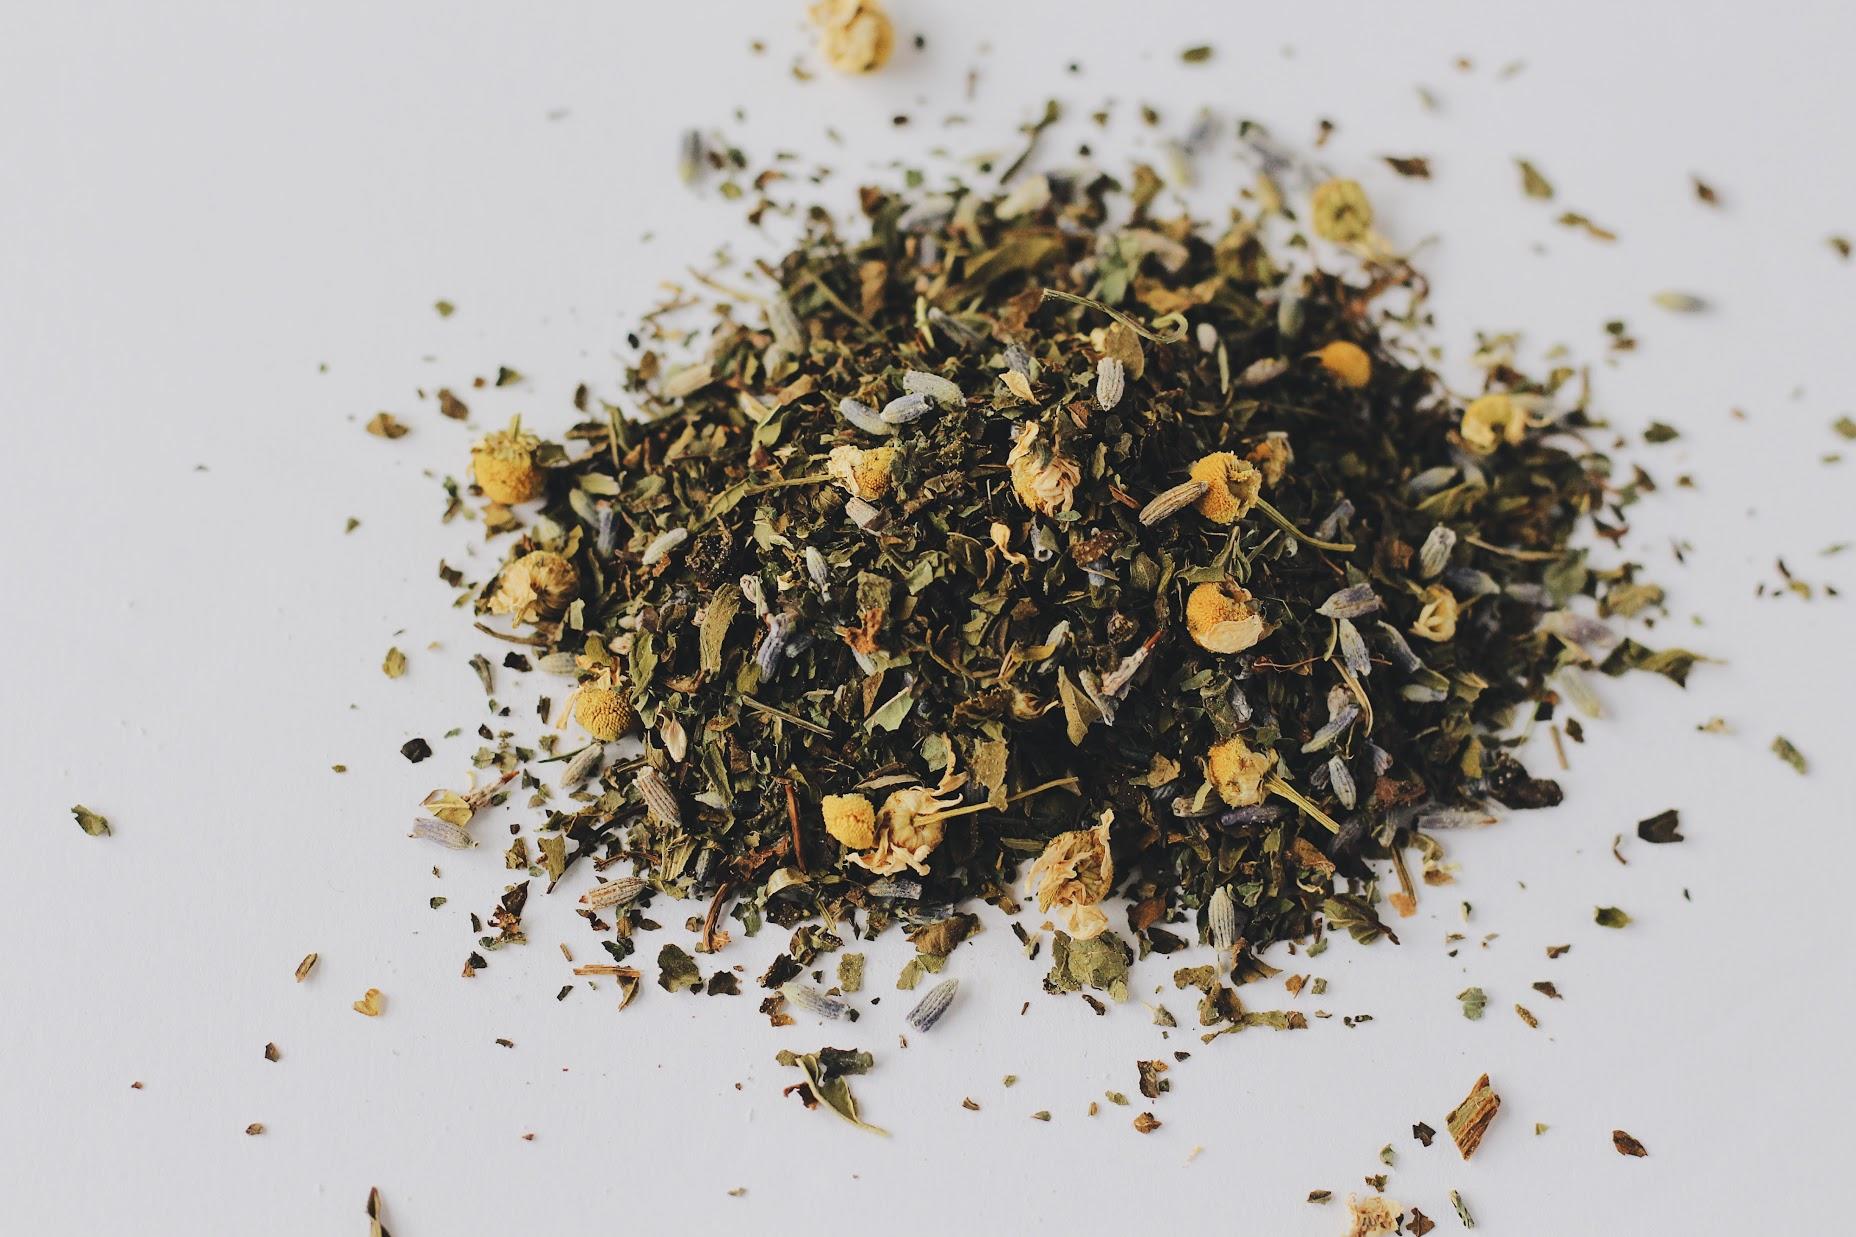 Herbal Bath Teas for Spring